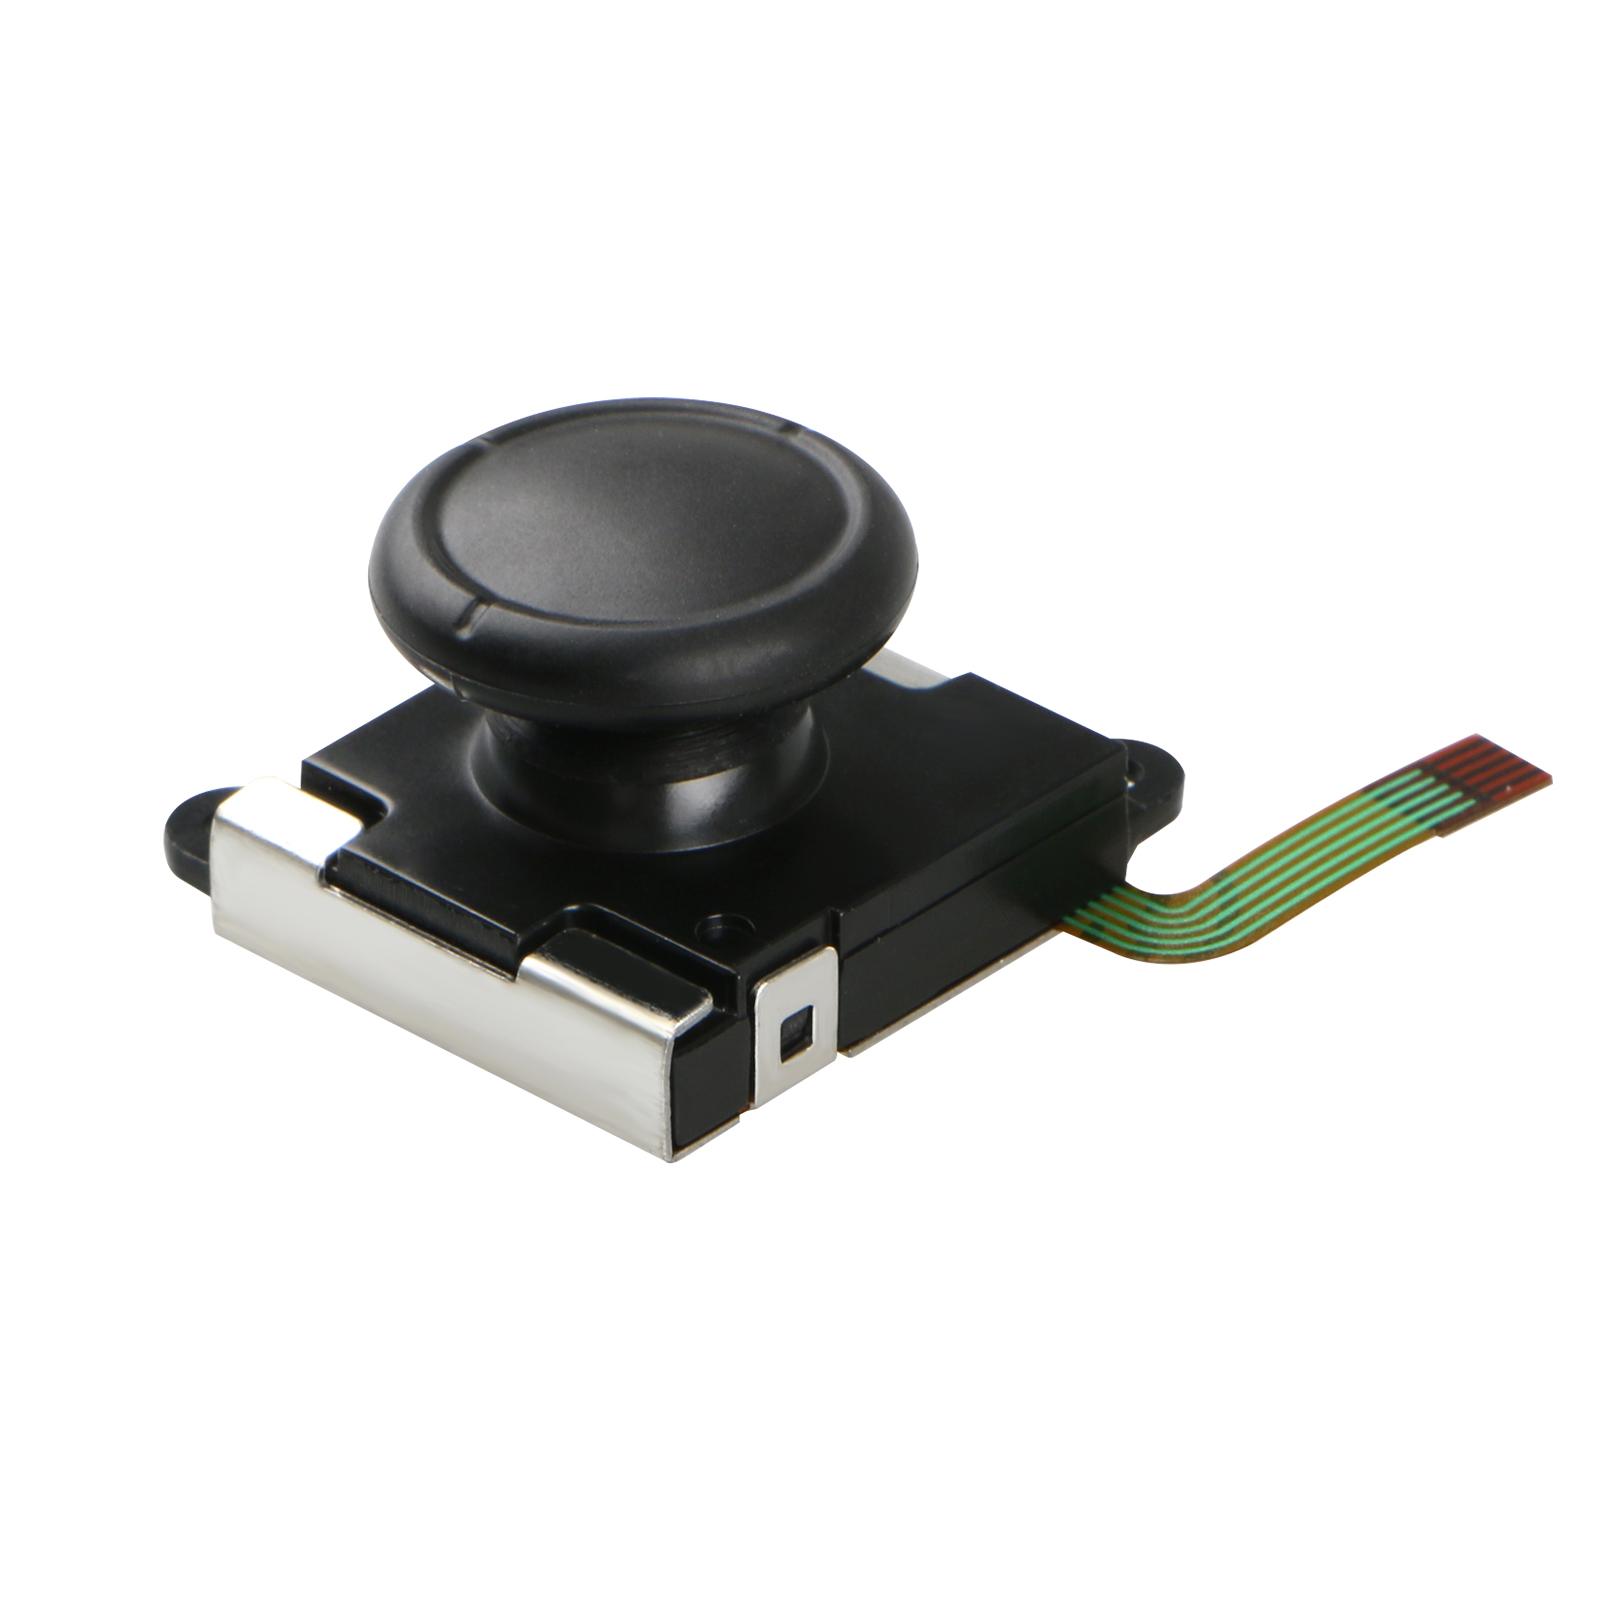 Analog-Stick-joystick-3D-Repair-Parts-for-Nintendo-Switch-Joy-Con-Controller-US